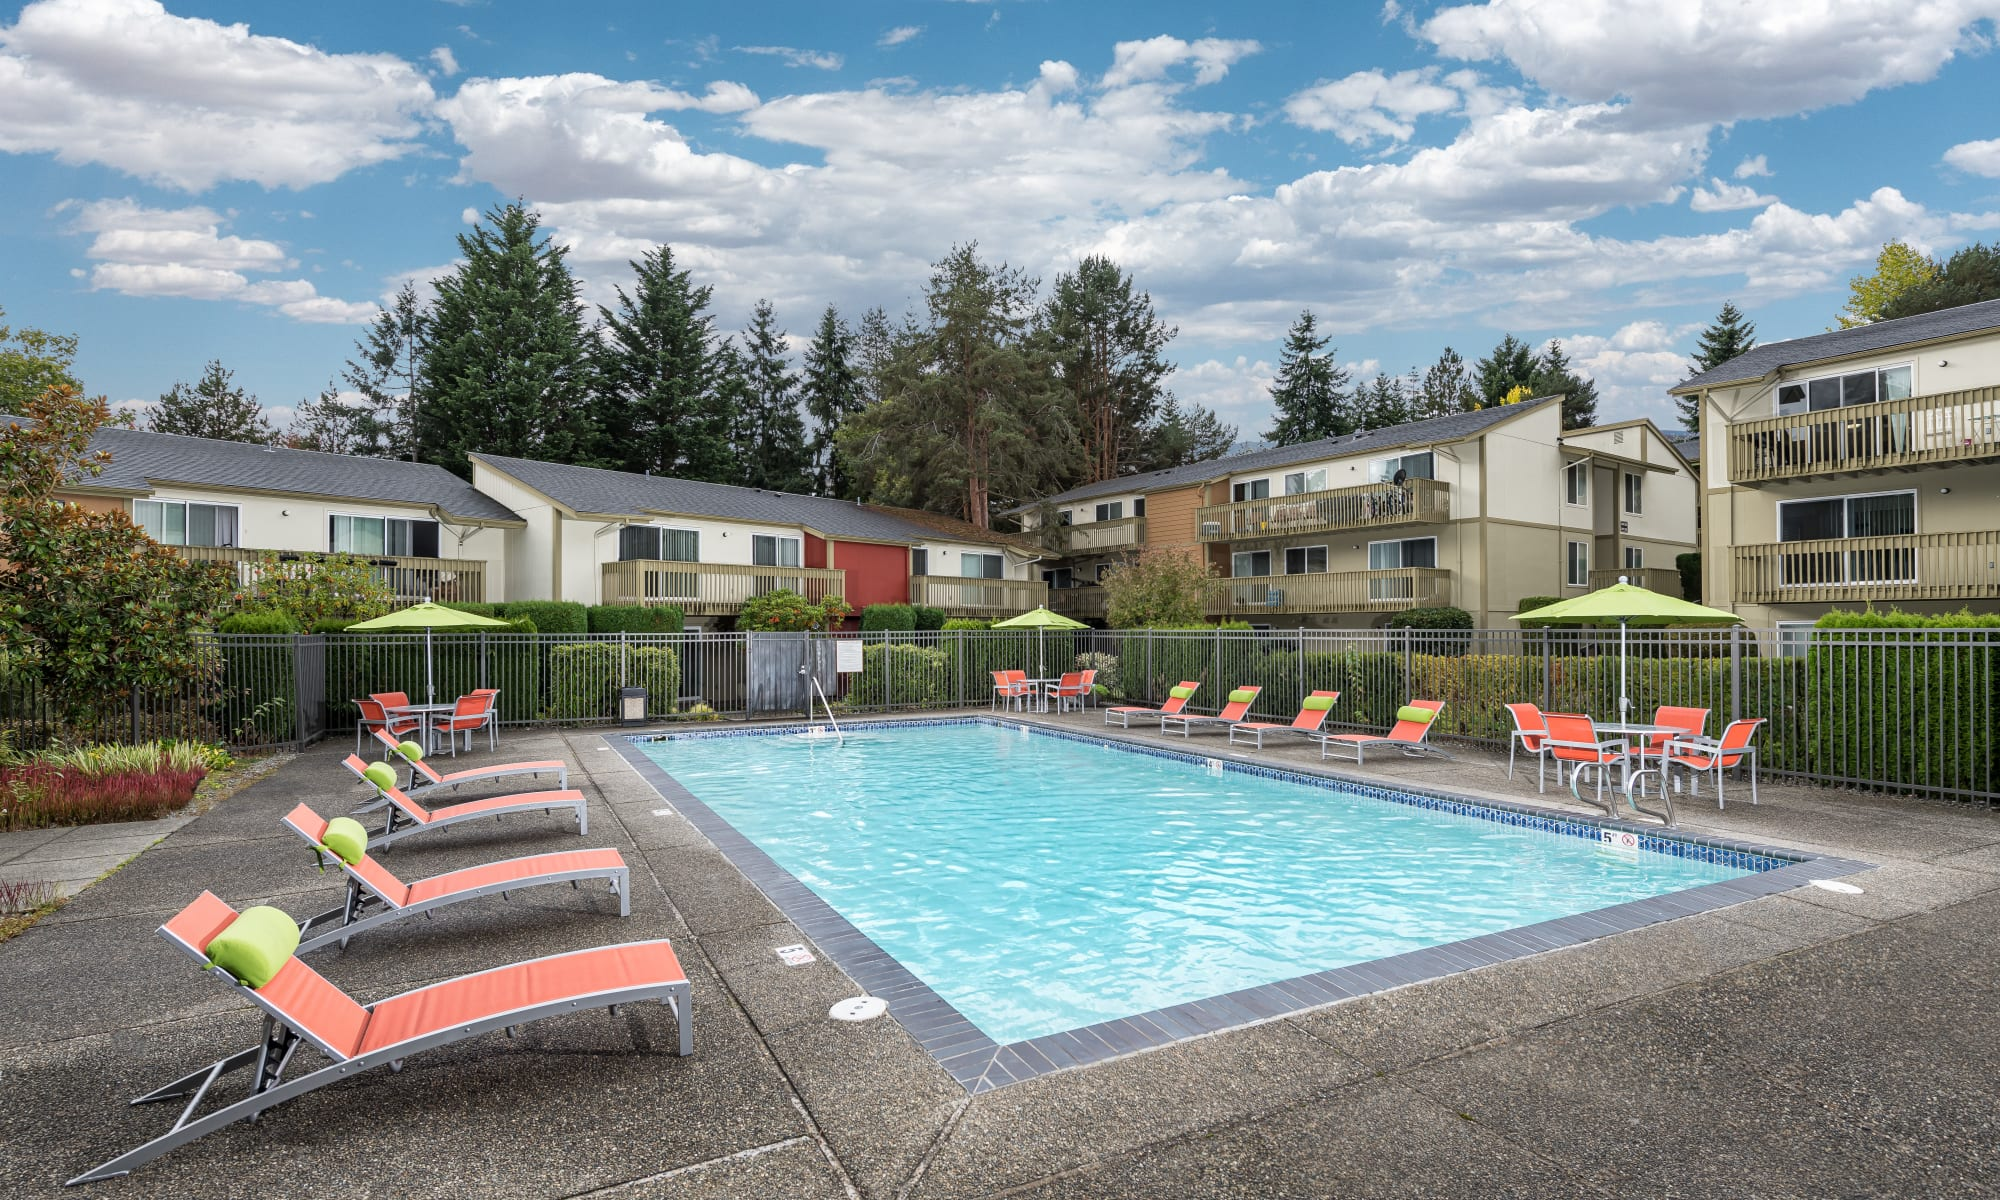 Edgewood Park Apartments in Bellevue, Washington